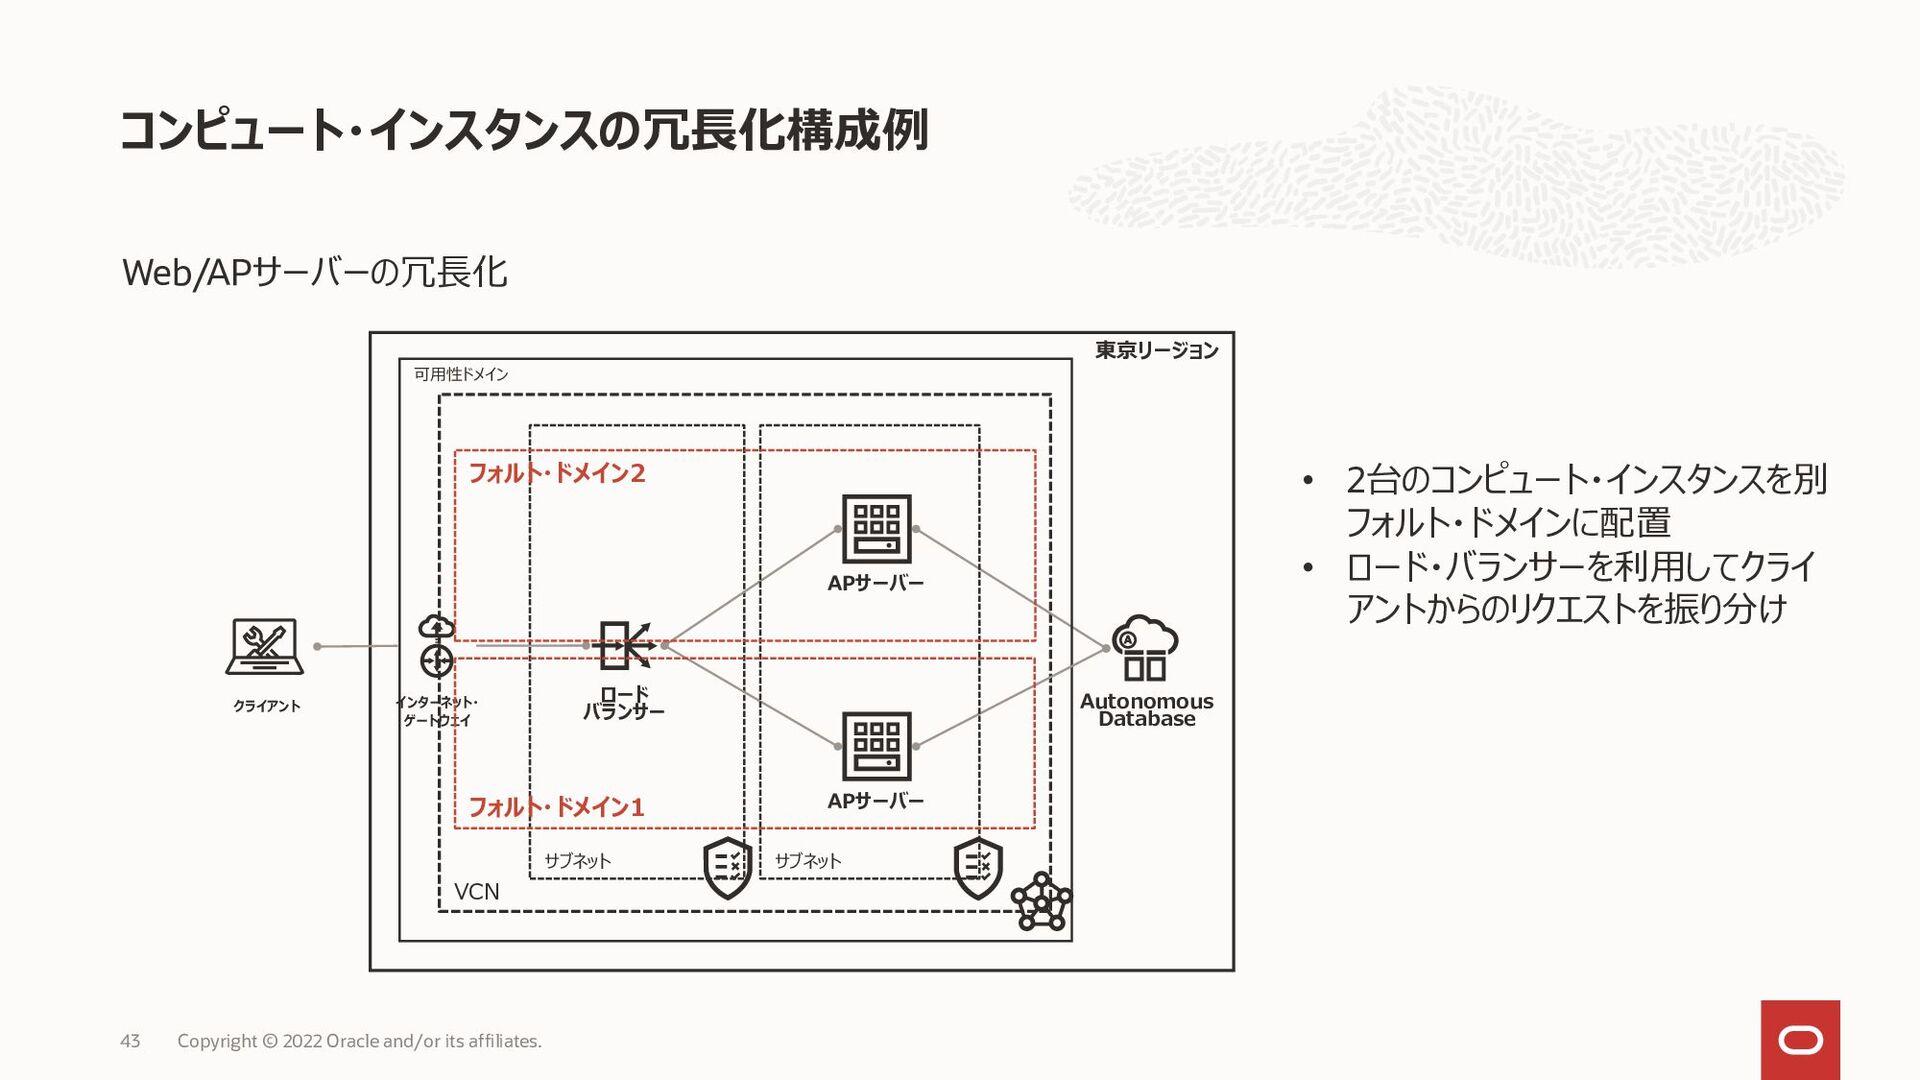 APサーバー VCN ロード バランサー Autonomous Database サブネット ...